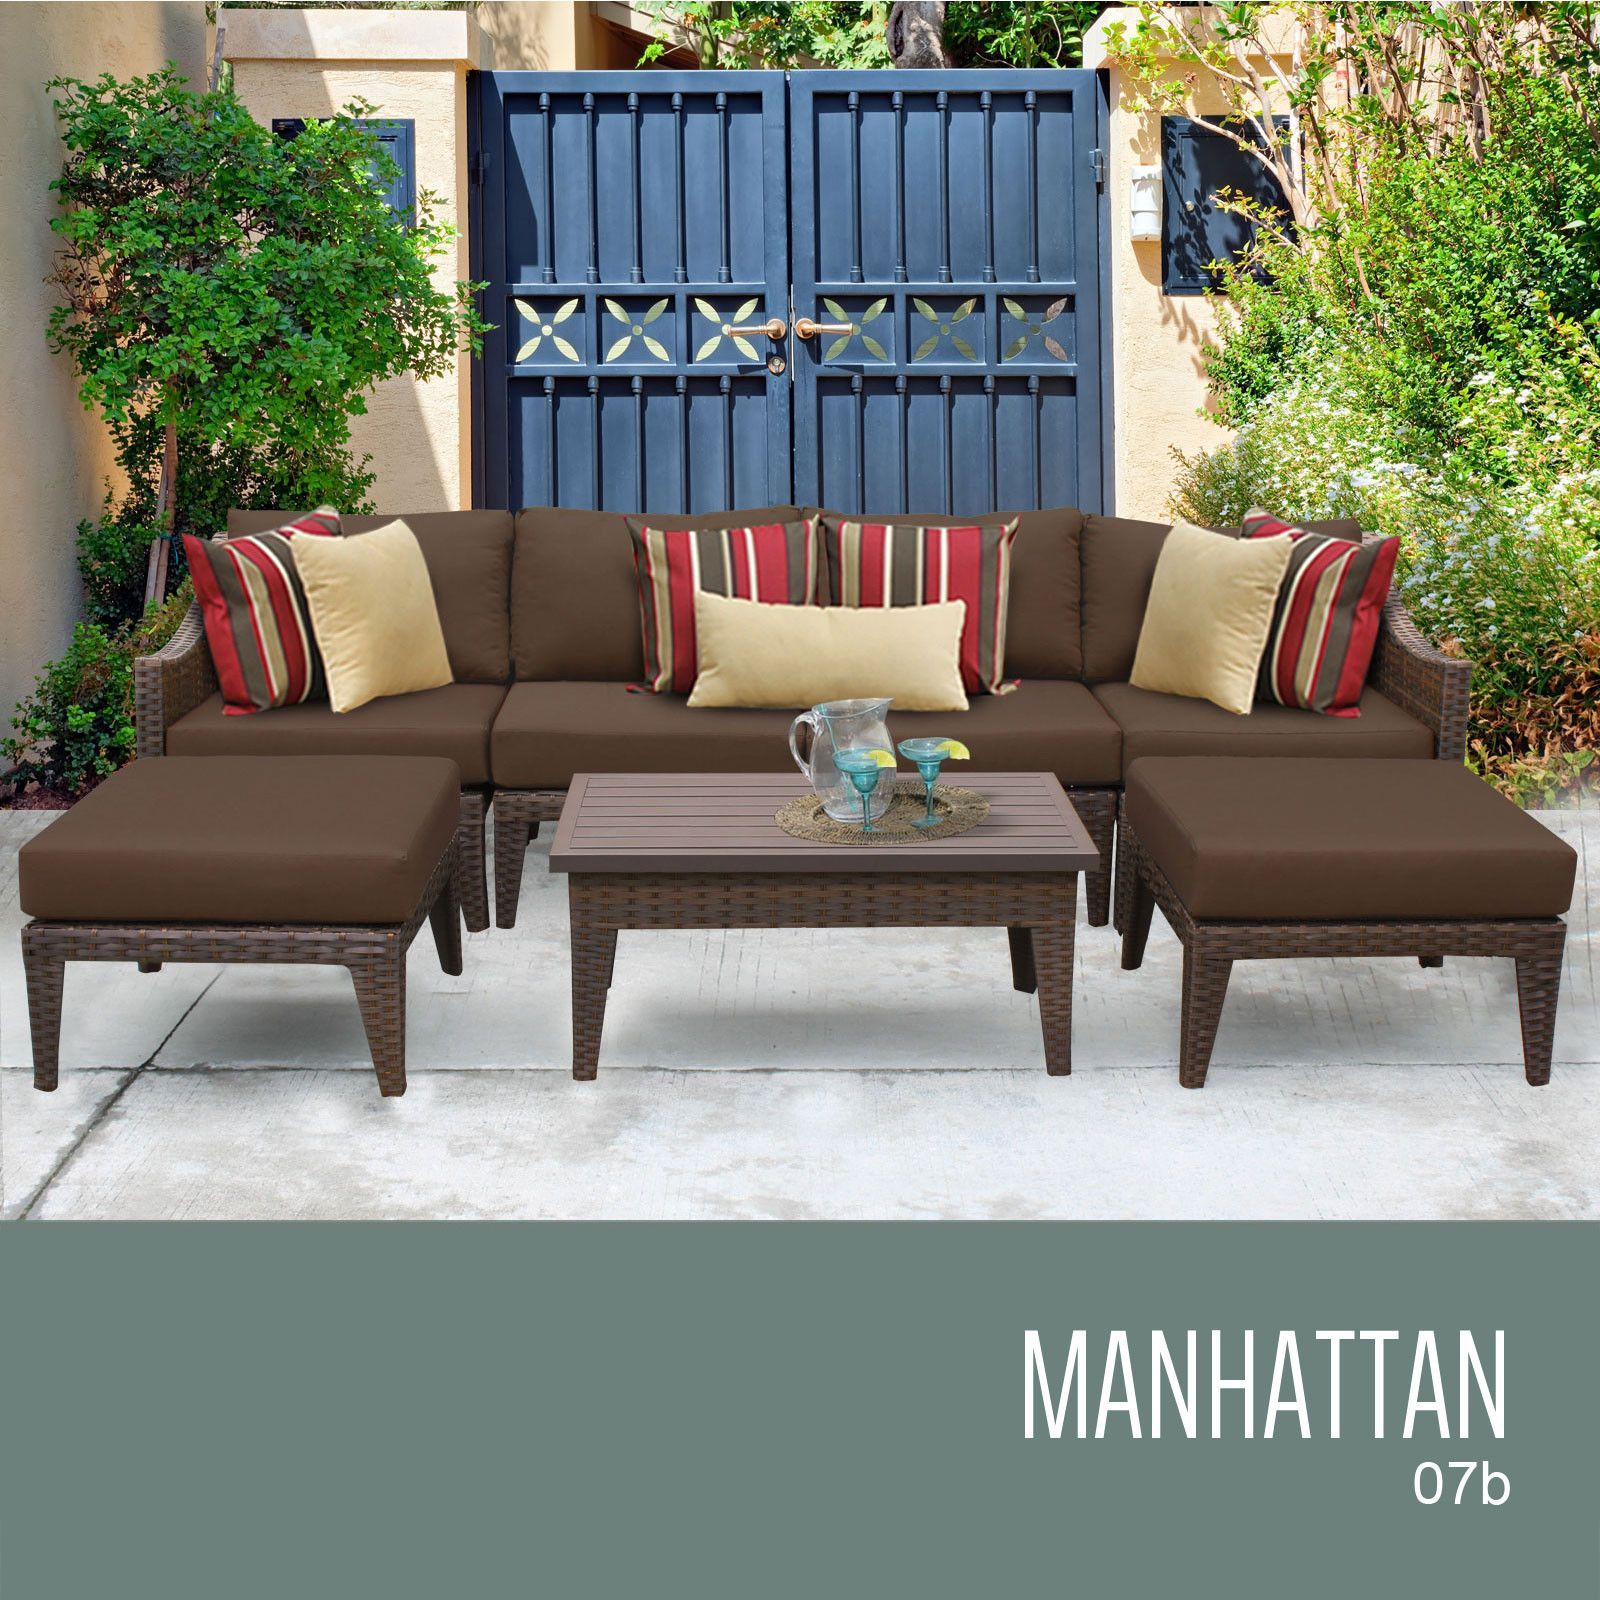 TKC MANHATTAN 7 Piece Outdoor Wicker Furniture Conversation Set 07b, Cocoa